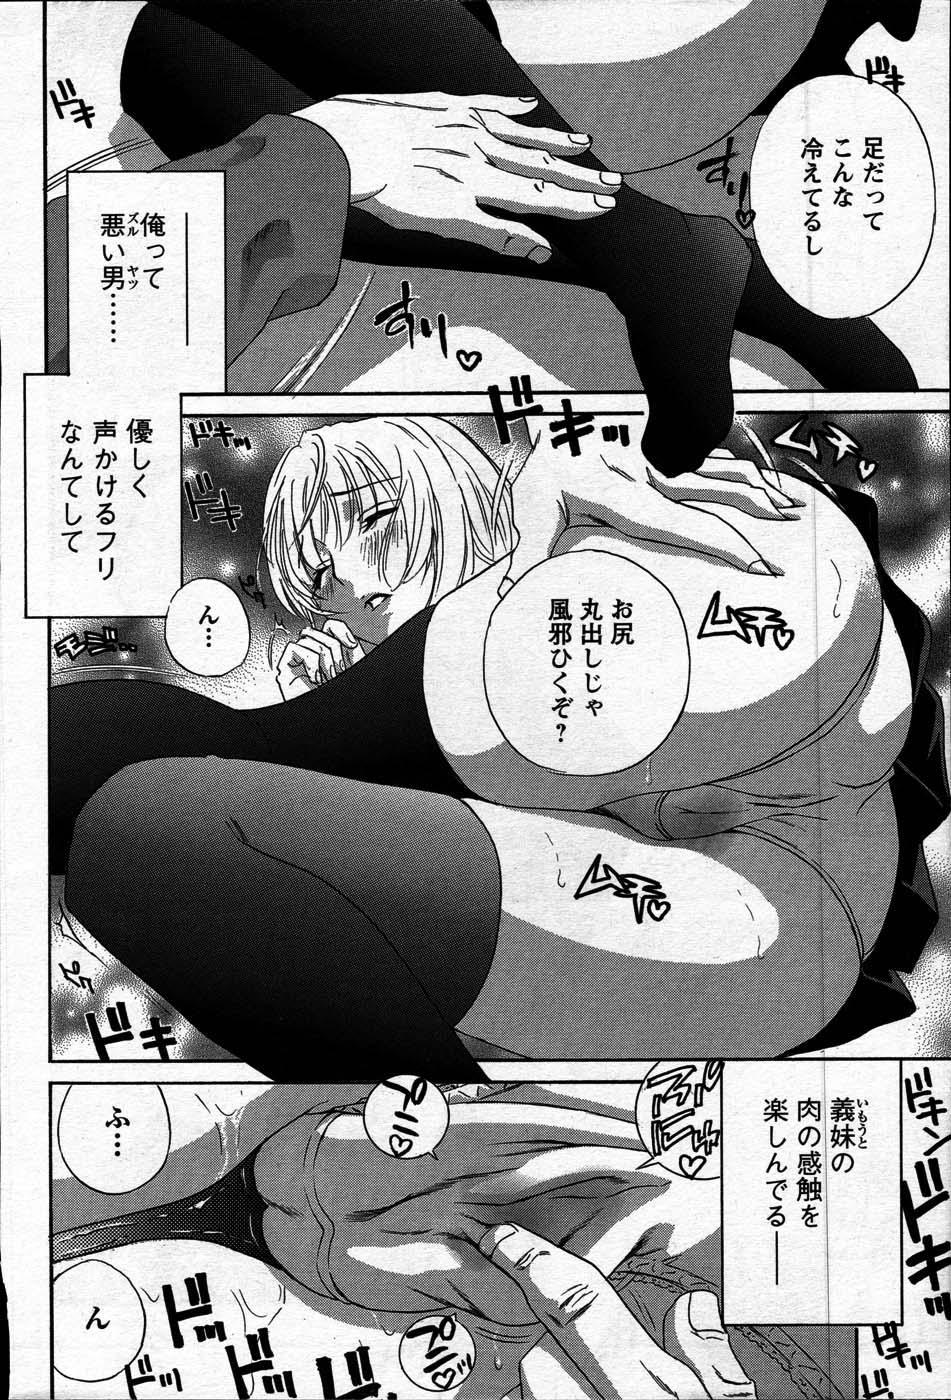 Comic Mens Young Special IKAZUCHI vol. 2 14